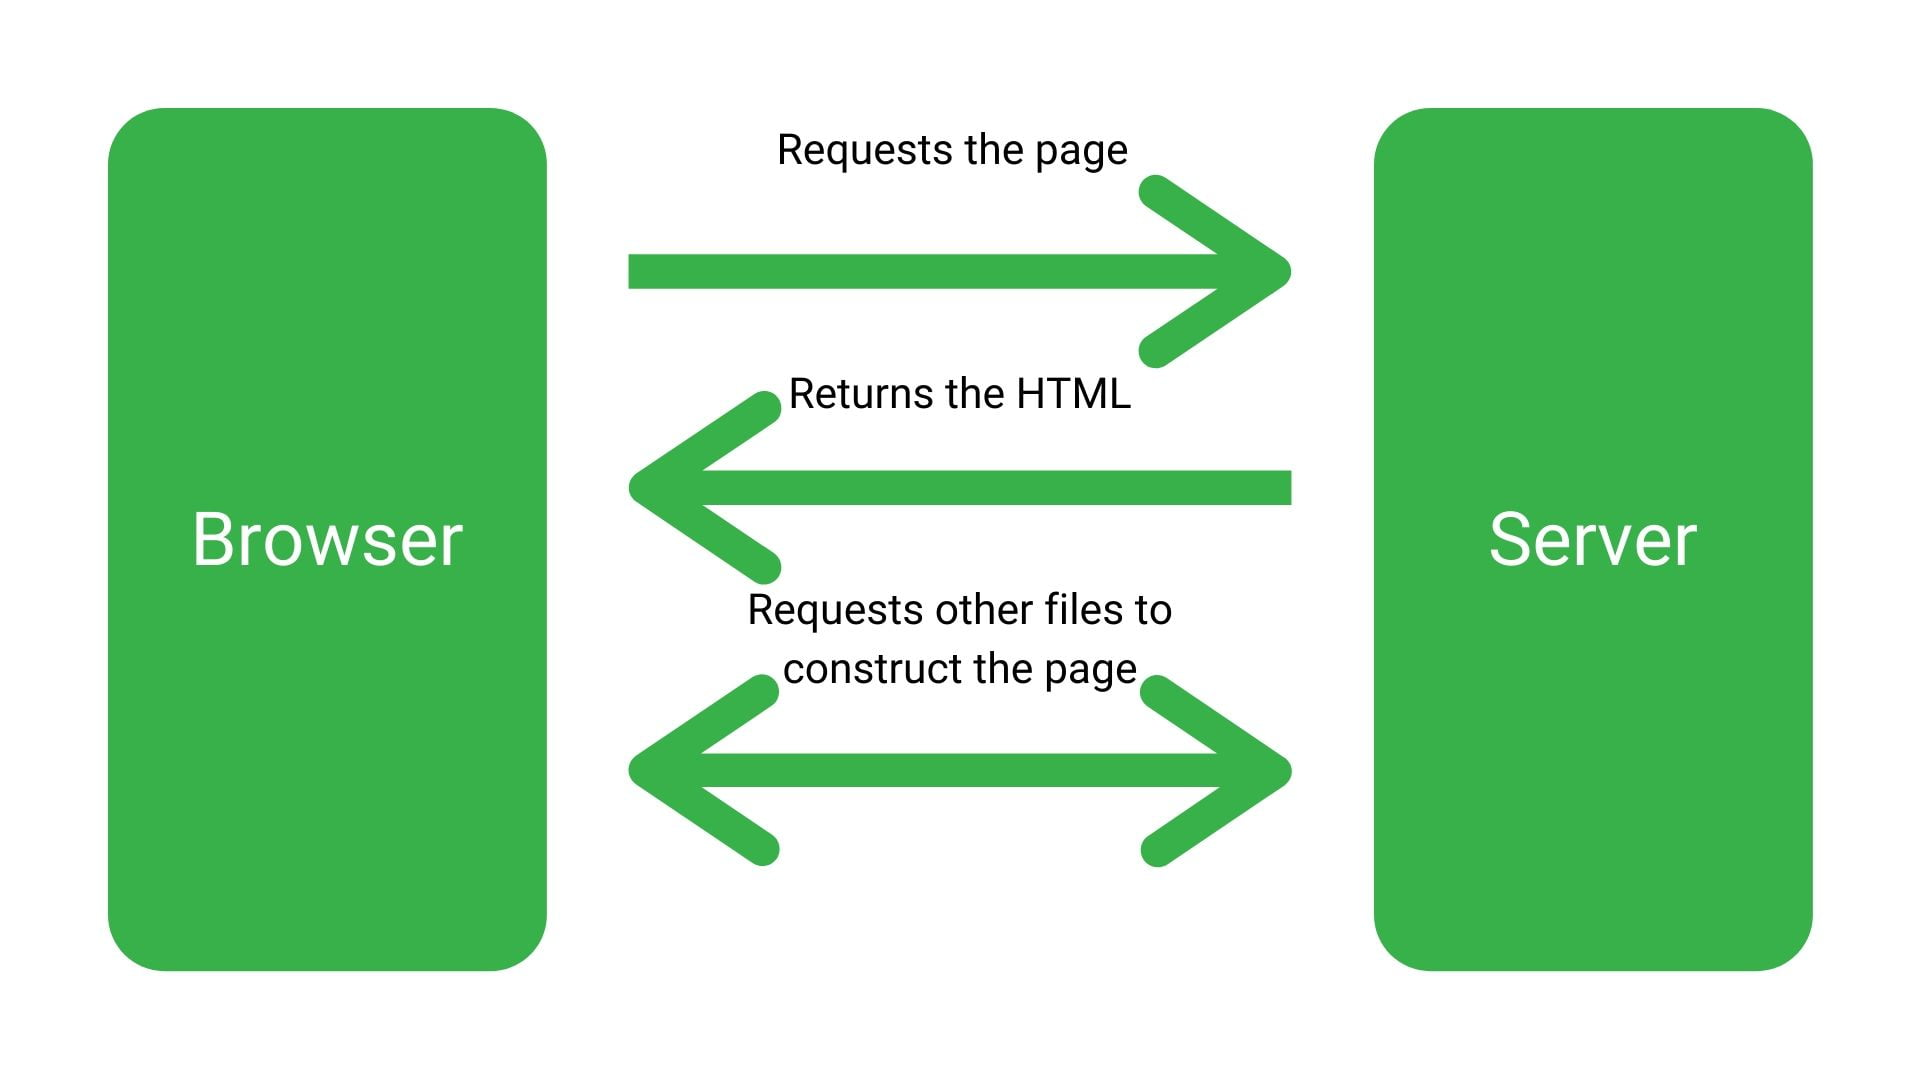 Google Bot scraping HTML site